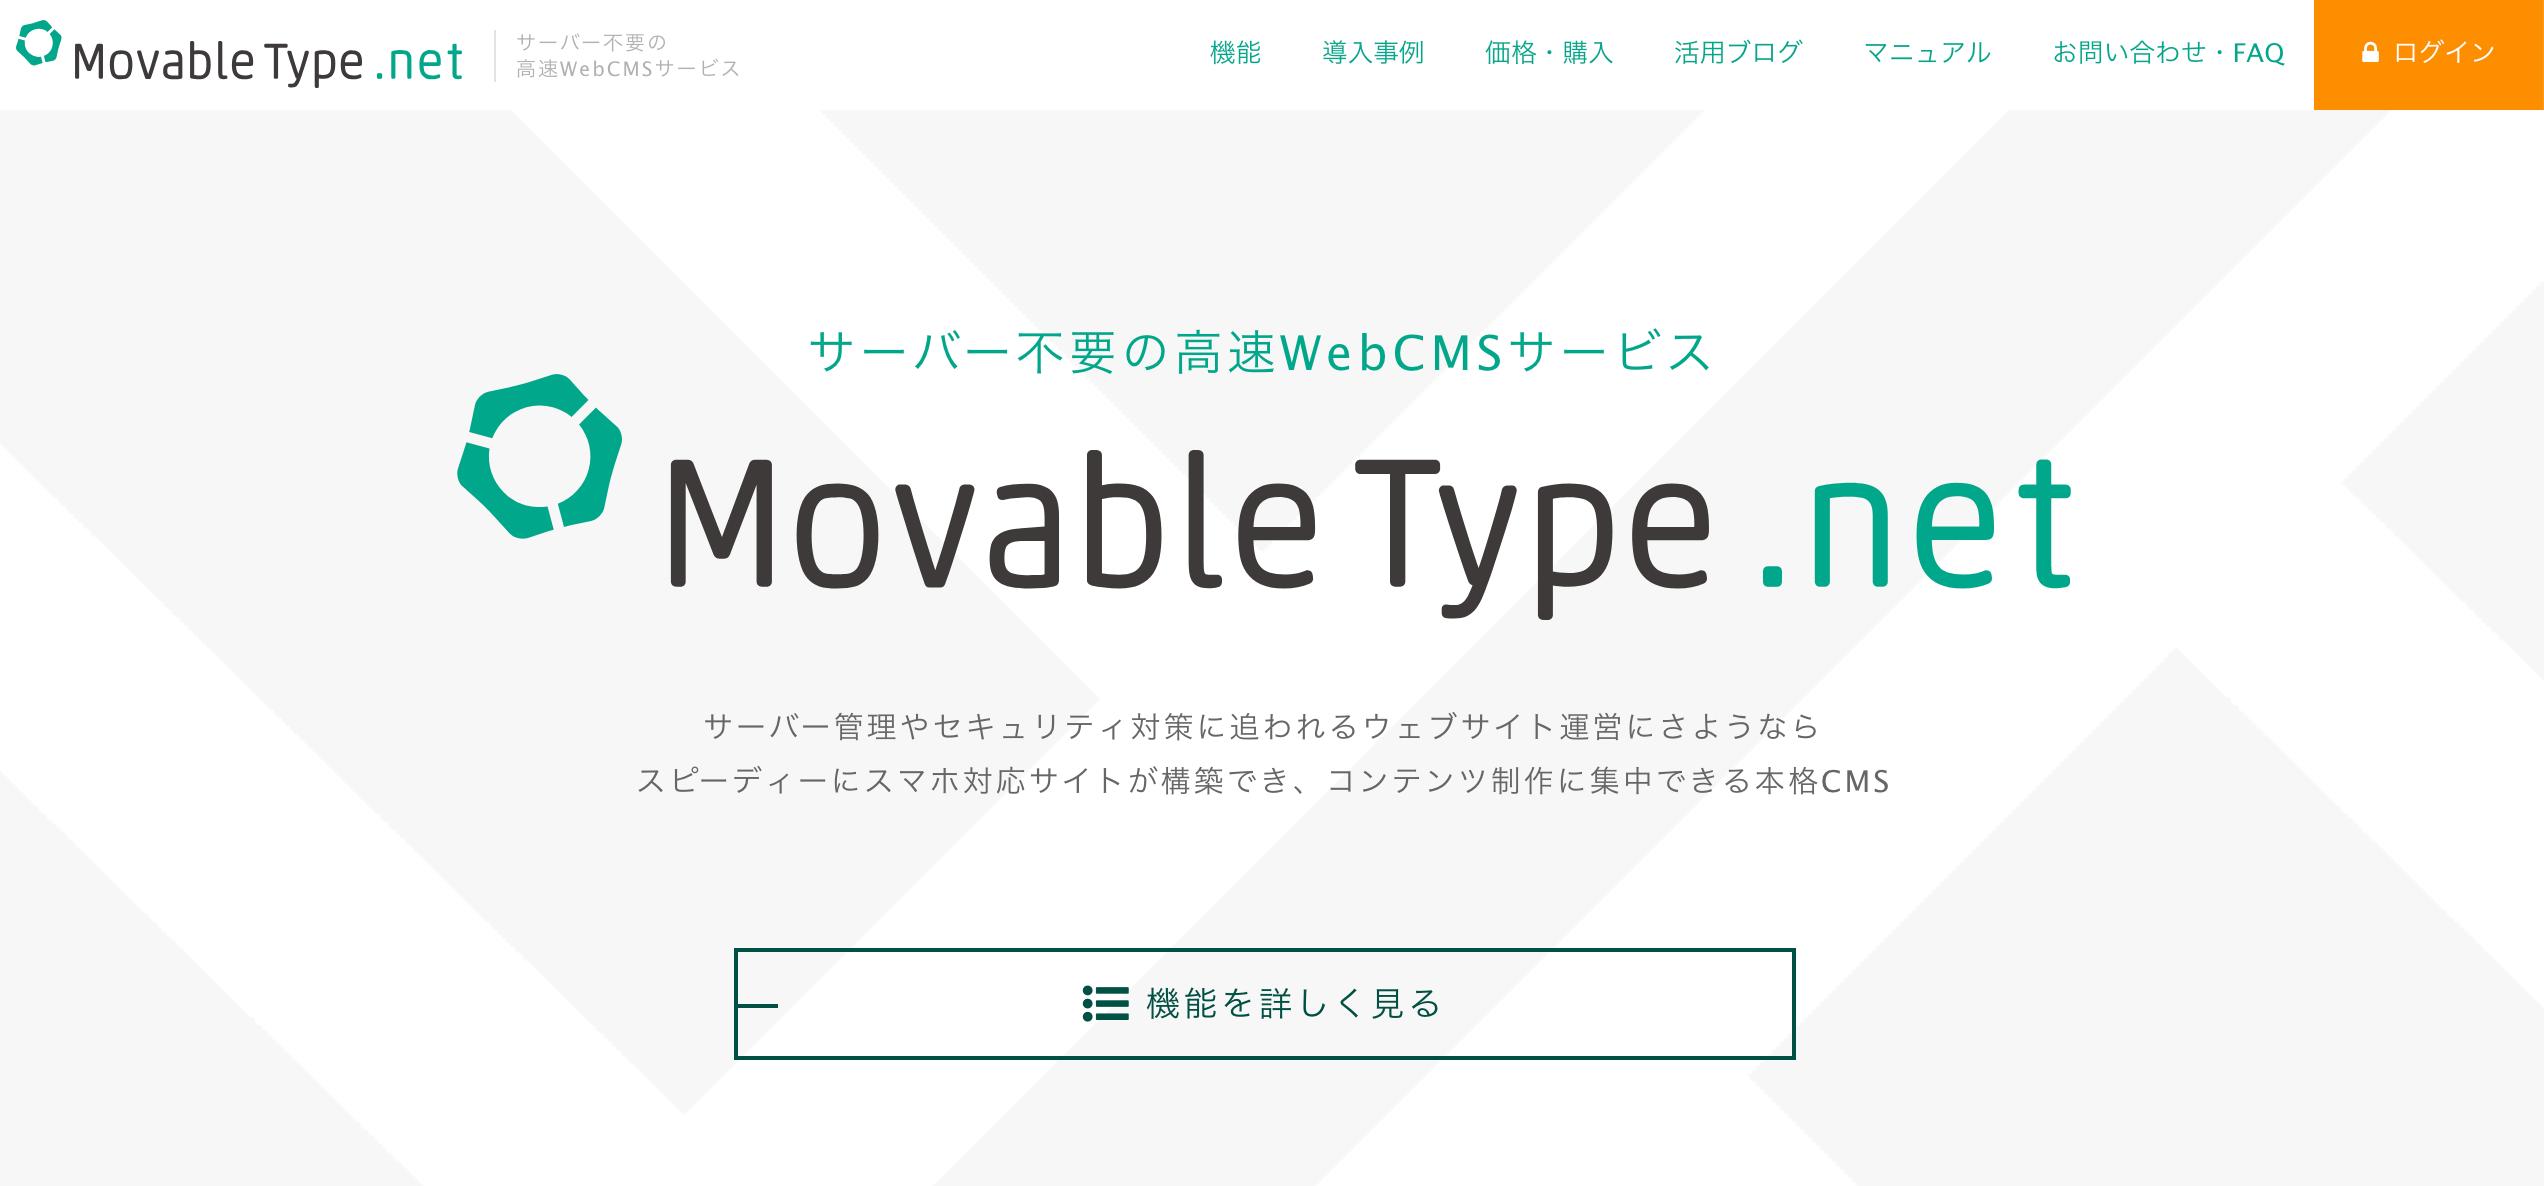 MovableType.netのキャプチャ画像